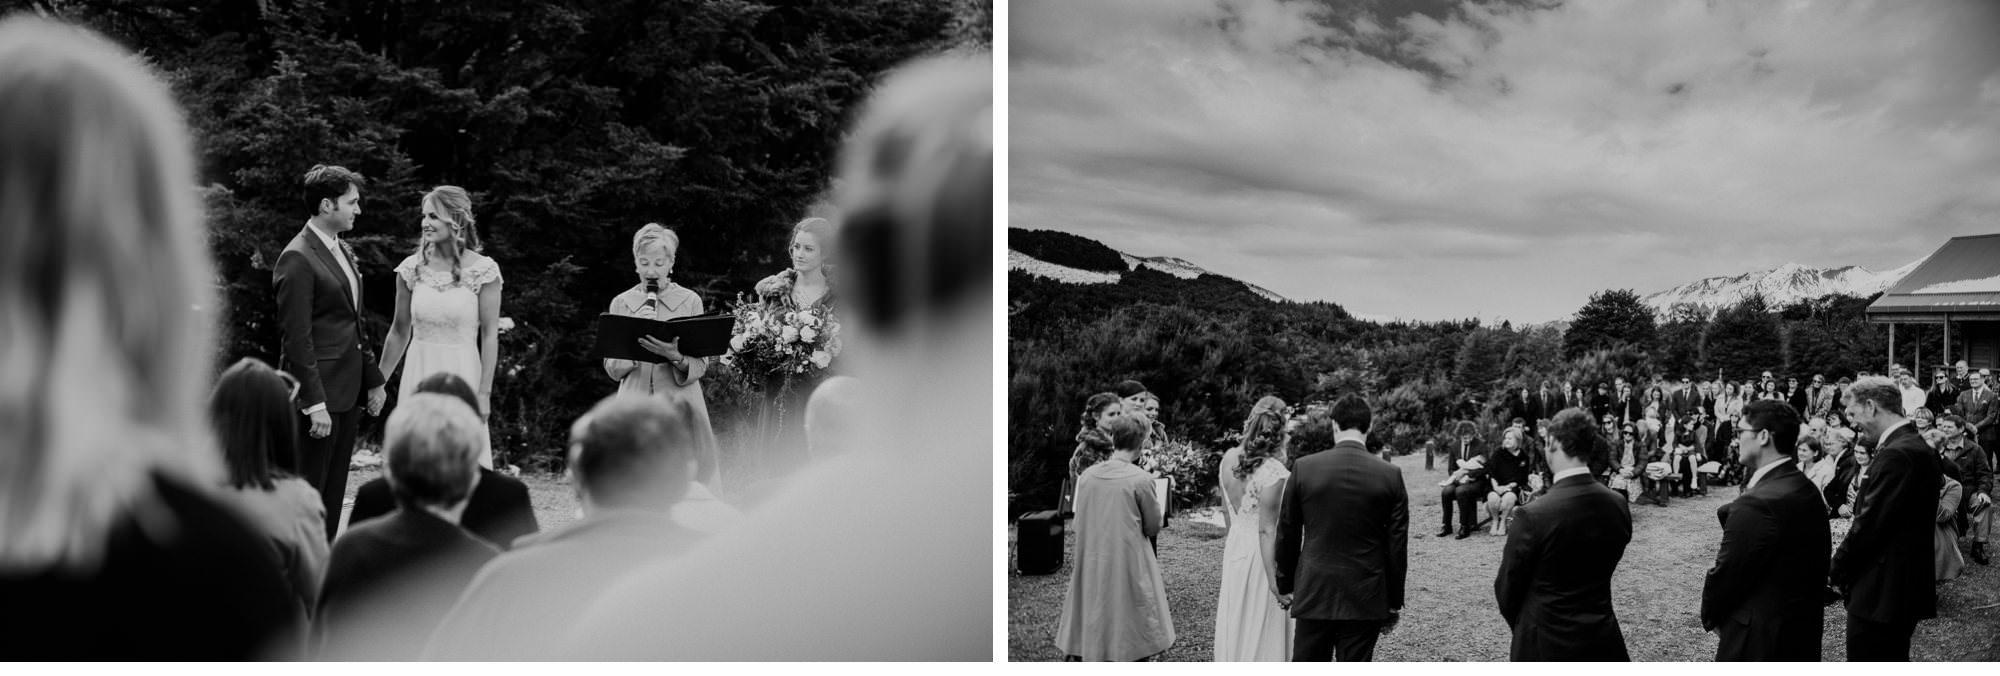 Castle-Hill-Lodge-Wedding-018.jpg